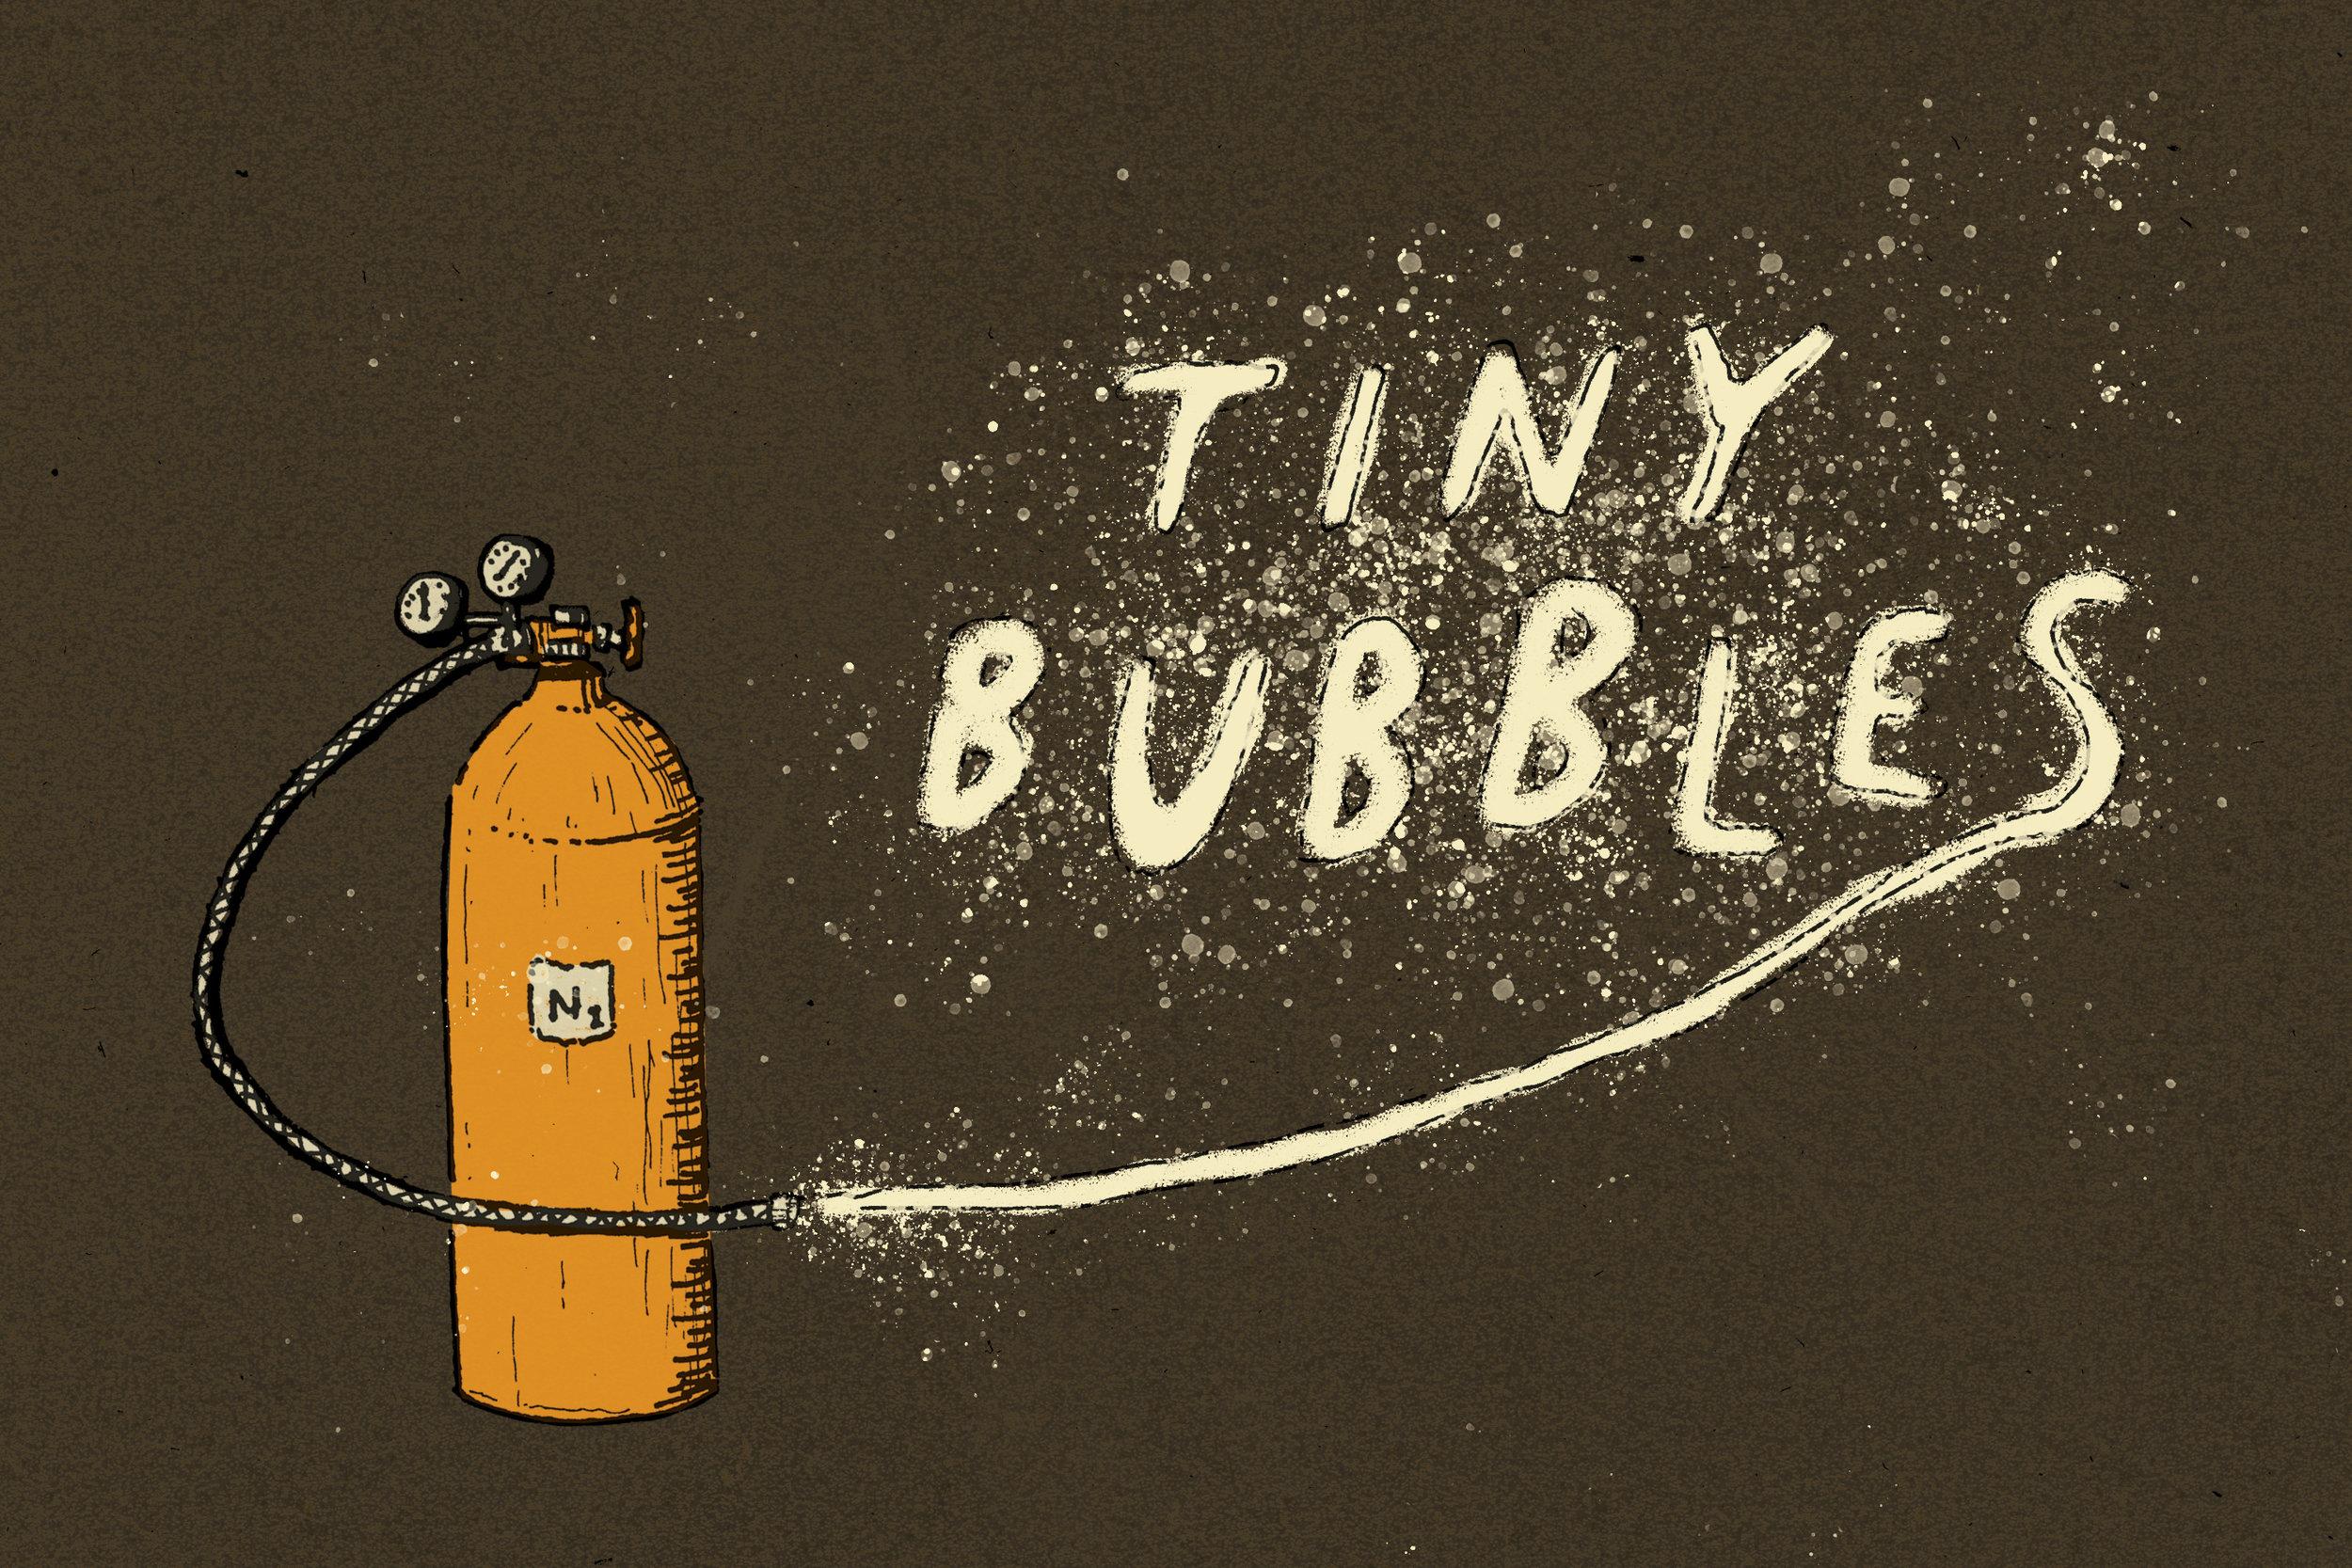 1_story5-tiny-bubbles-2000x3000.jpg